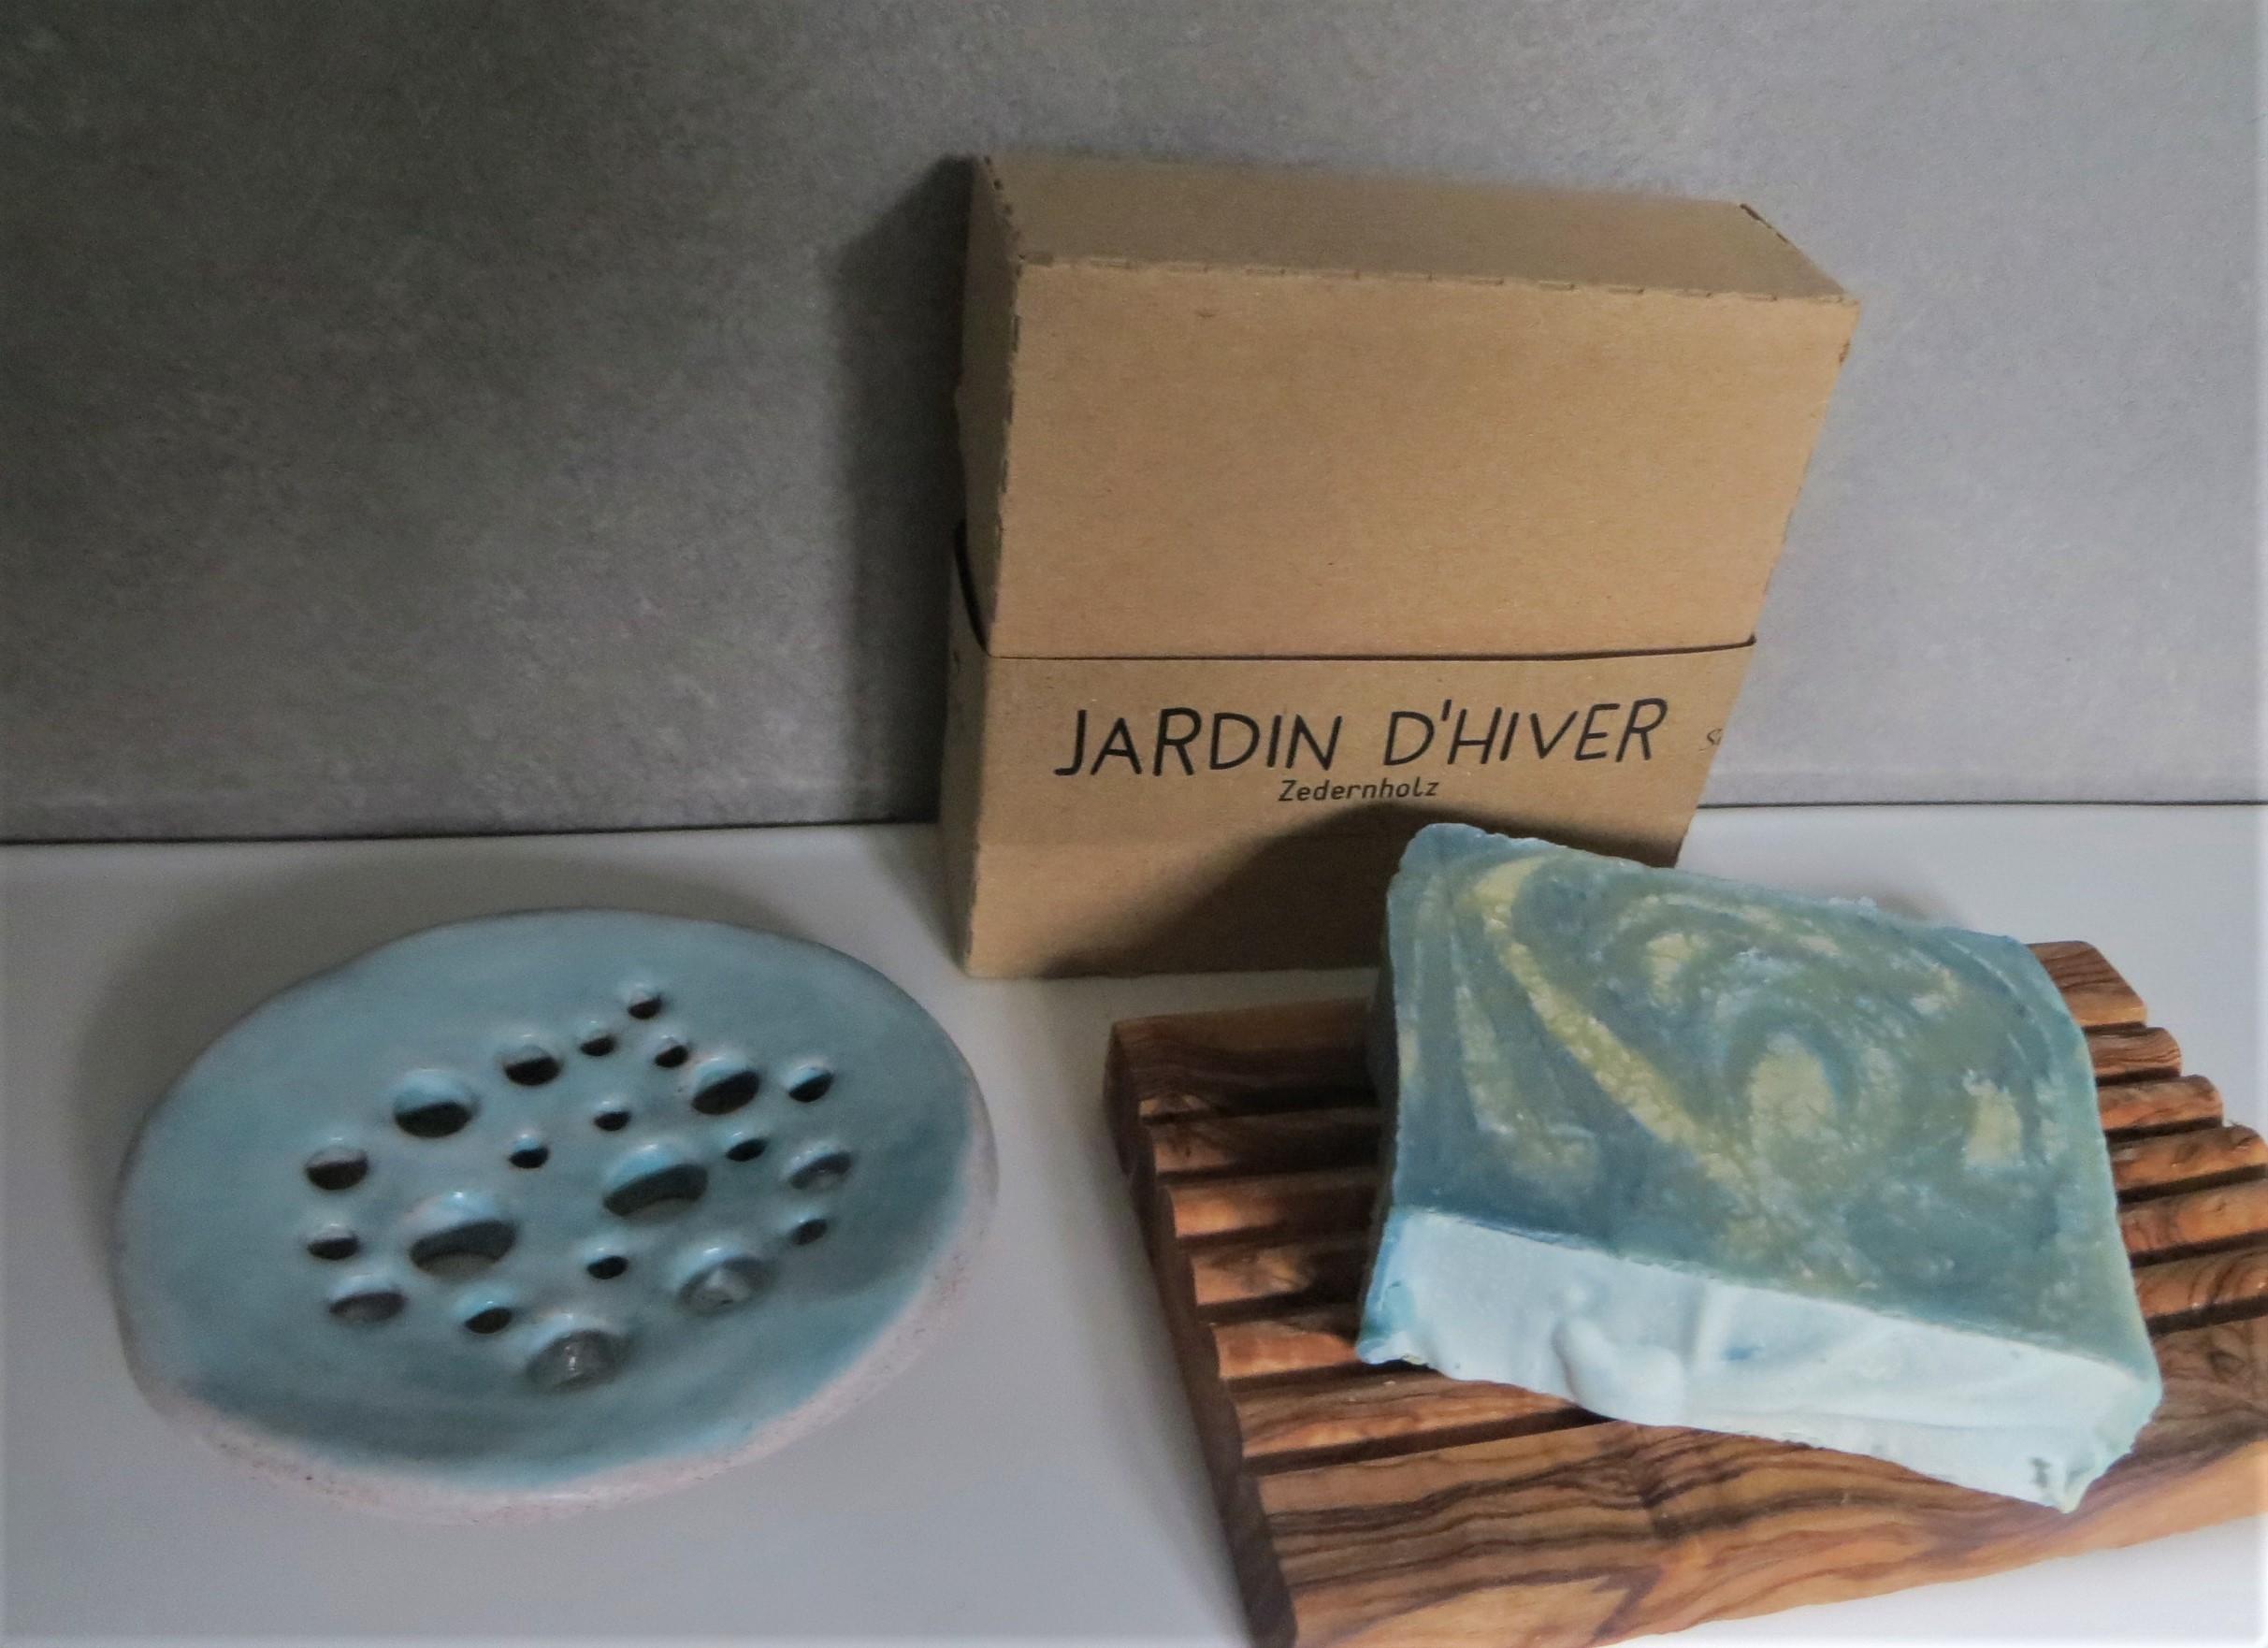 Nützlichwellness - Seife JARDIN DHIVER Feige Brombeere Zedernholz - Onlineshop Tante Emmer